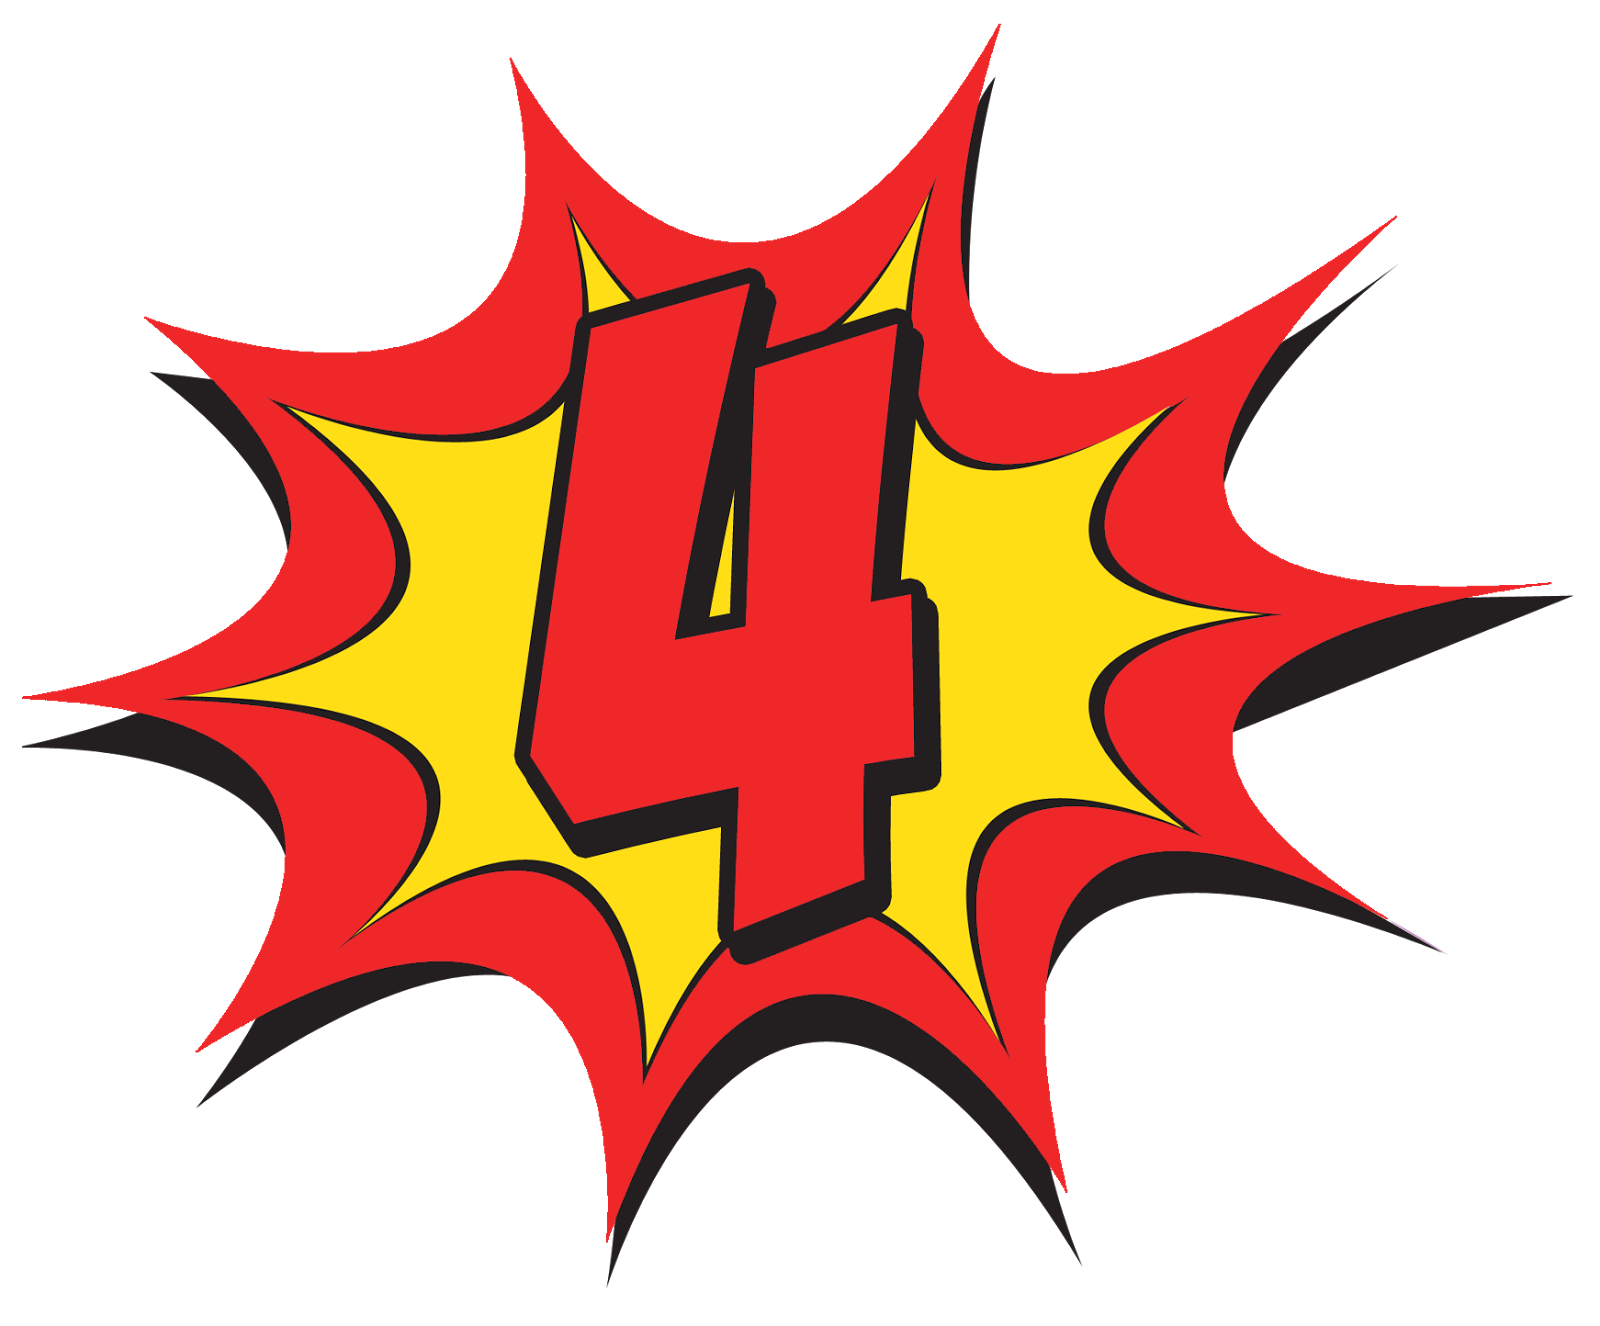 Ic47dk9usuqmb Png 1600 1326 Spiderman Birthday Wonder Woman Birthday Spiderman Party